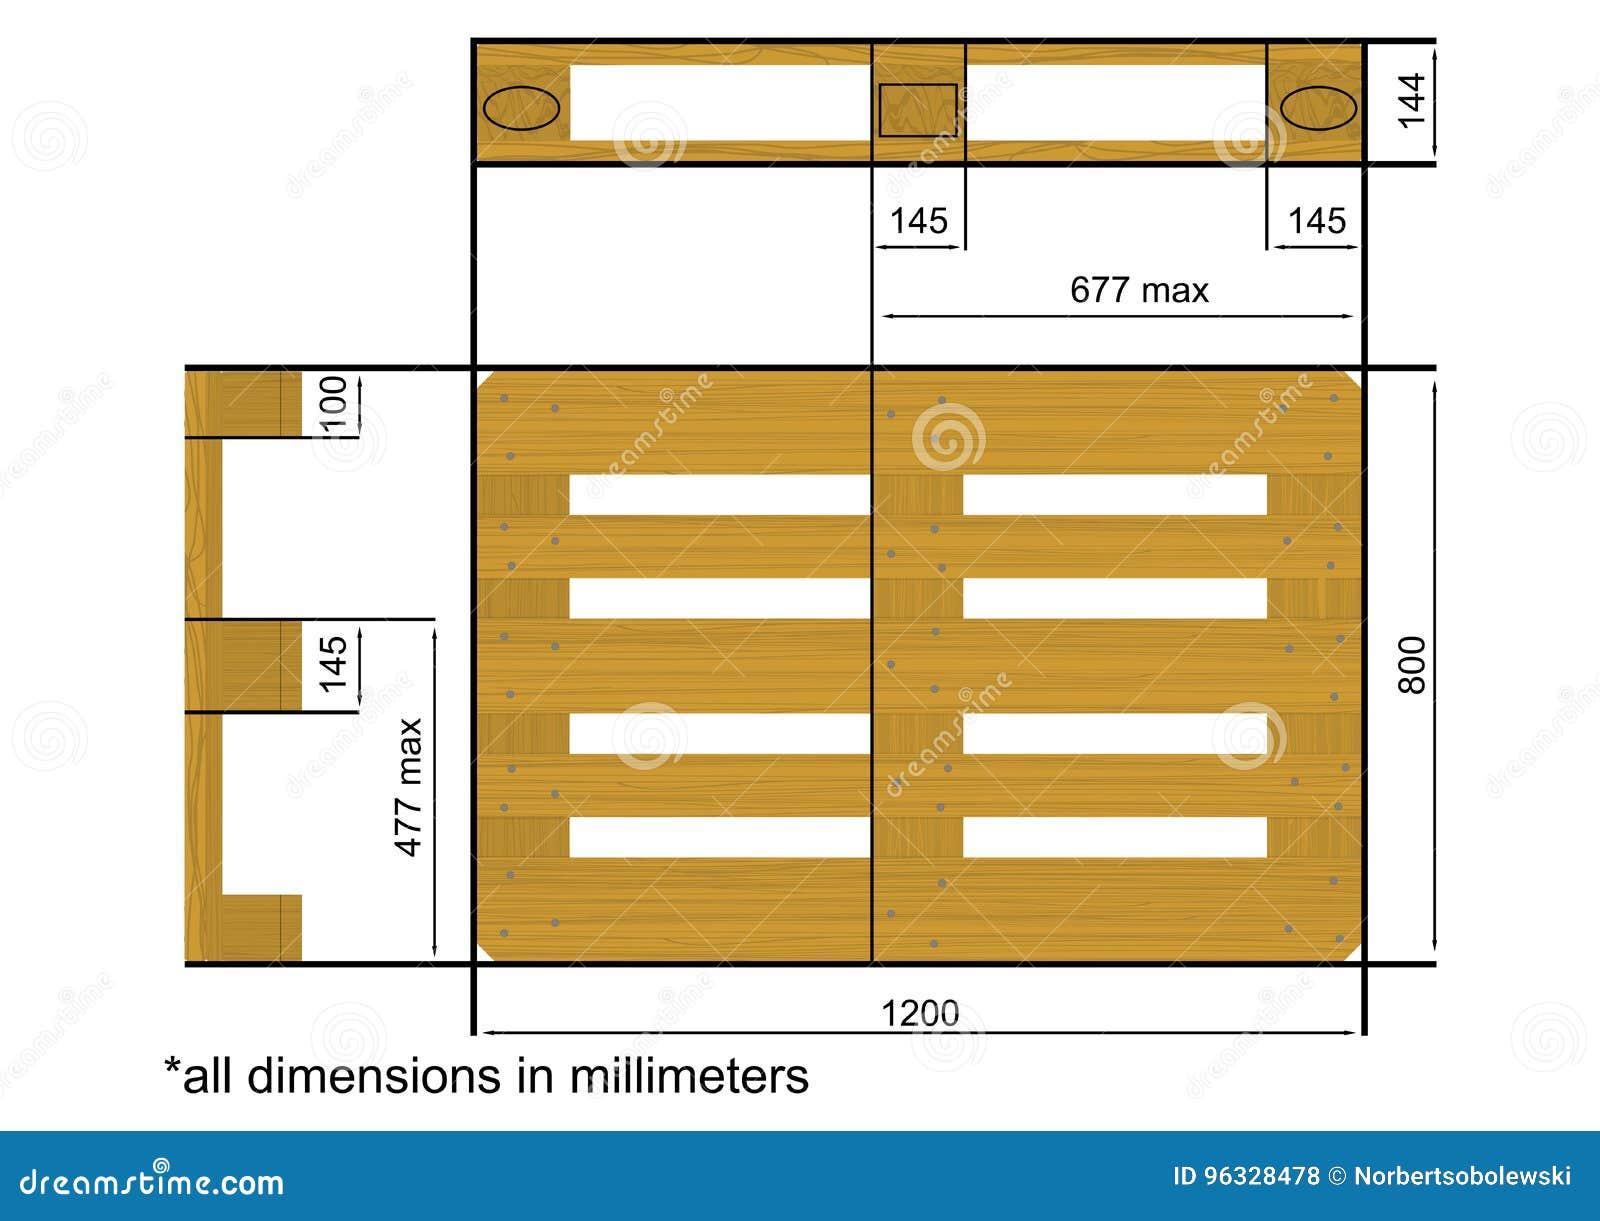 euro palette illustration de vecteur illustration du m moire 96328478. Black Bedroom Furniture Sets. Home Design Ideas